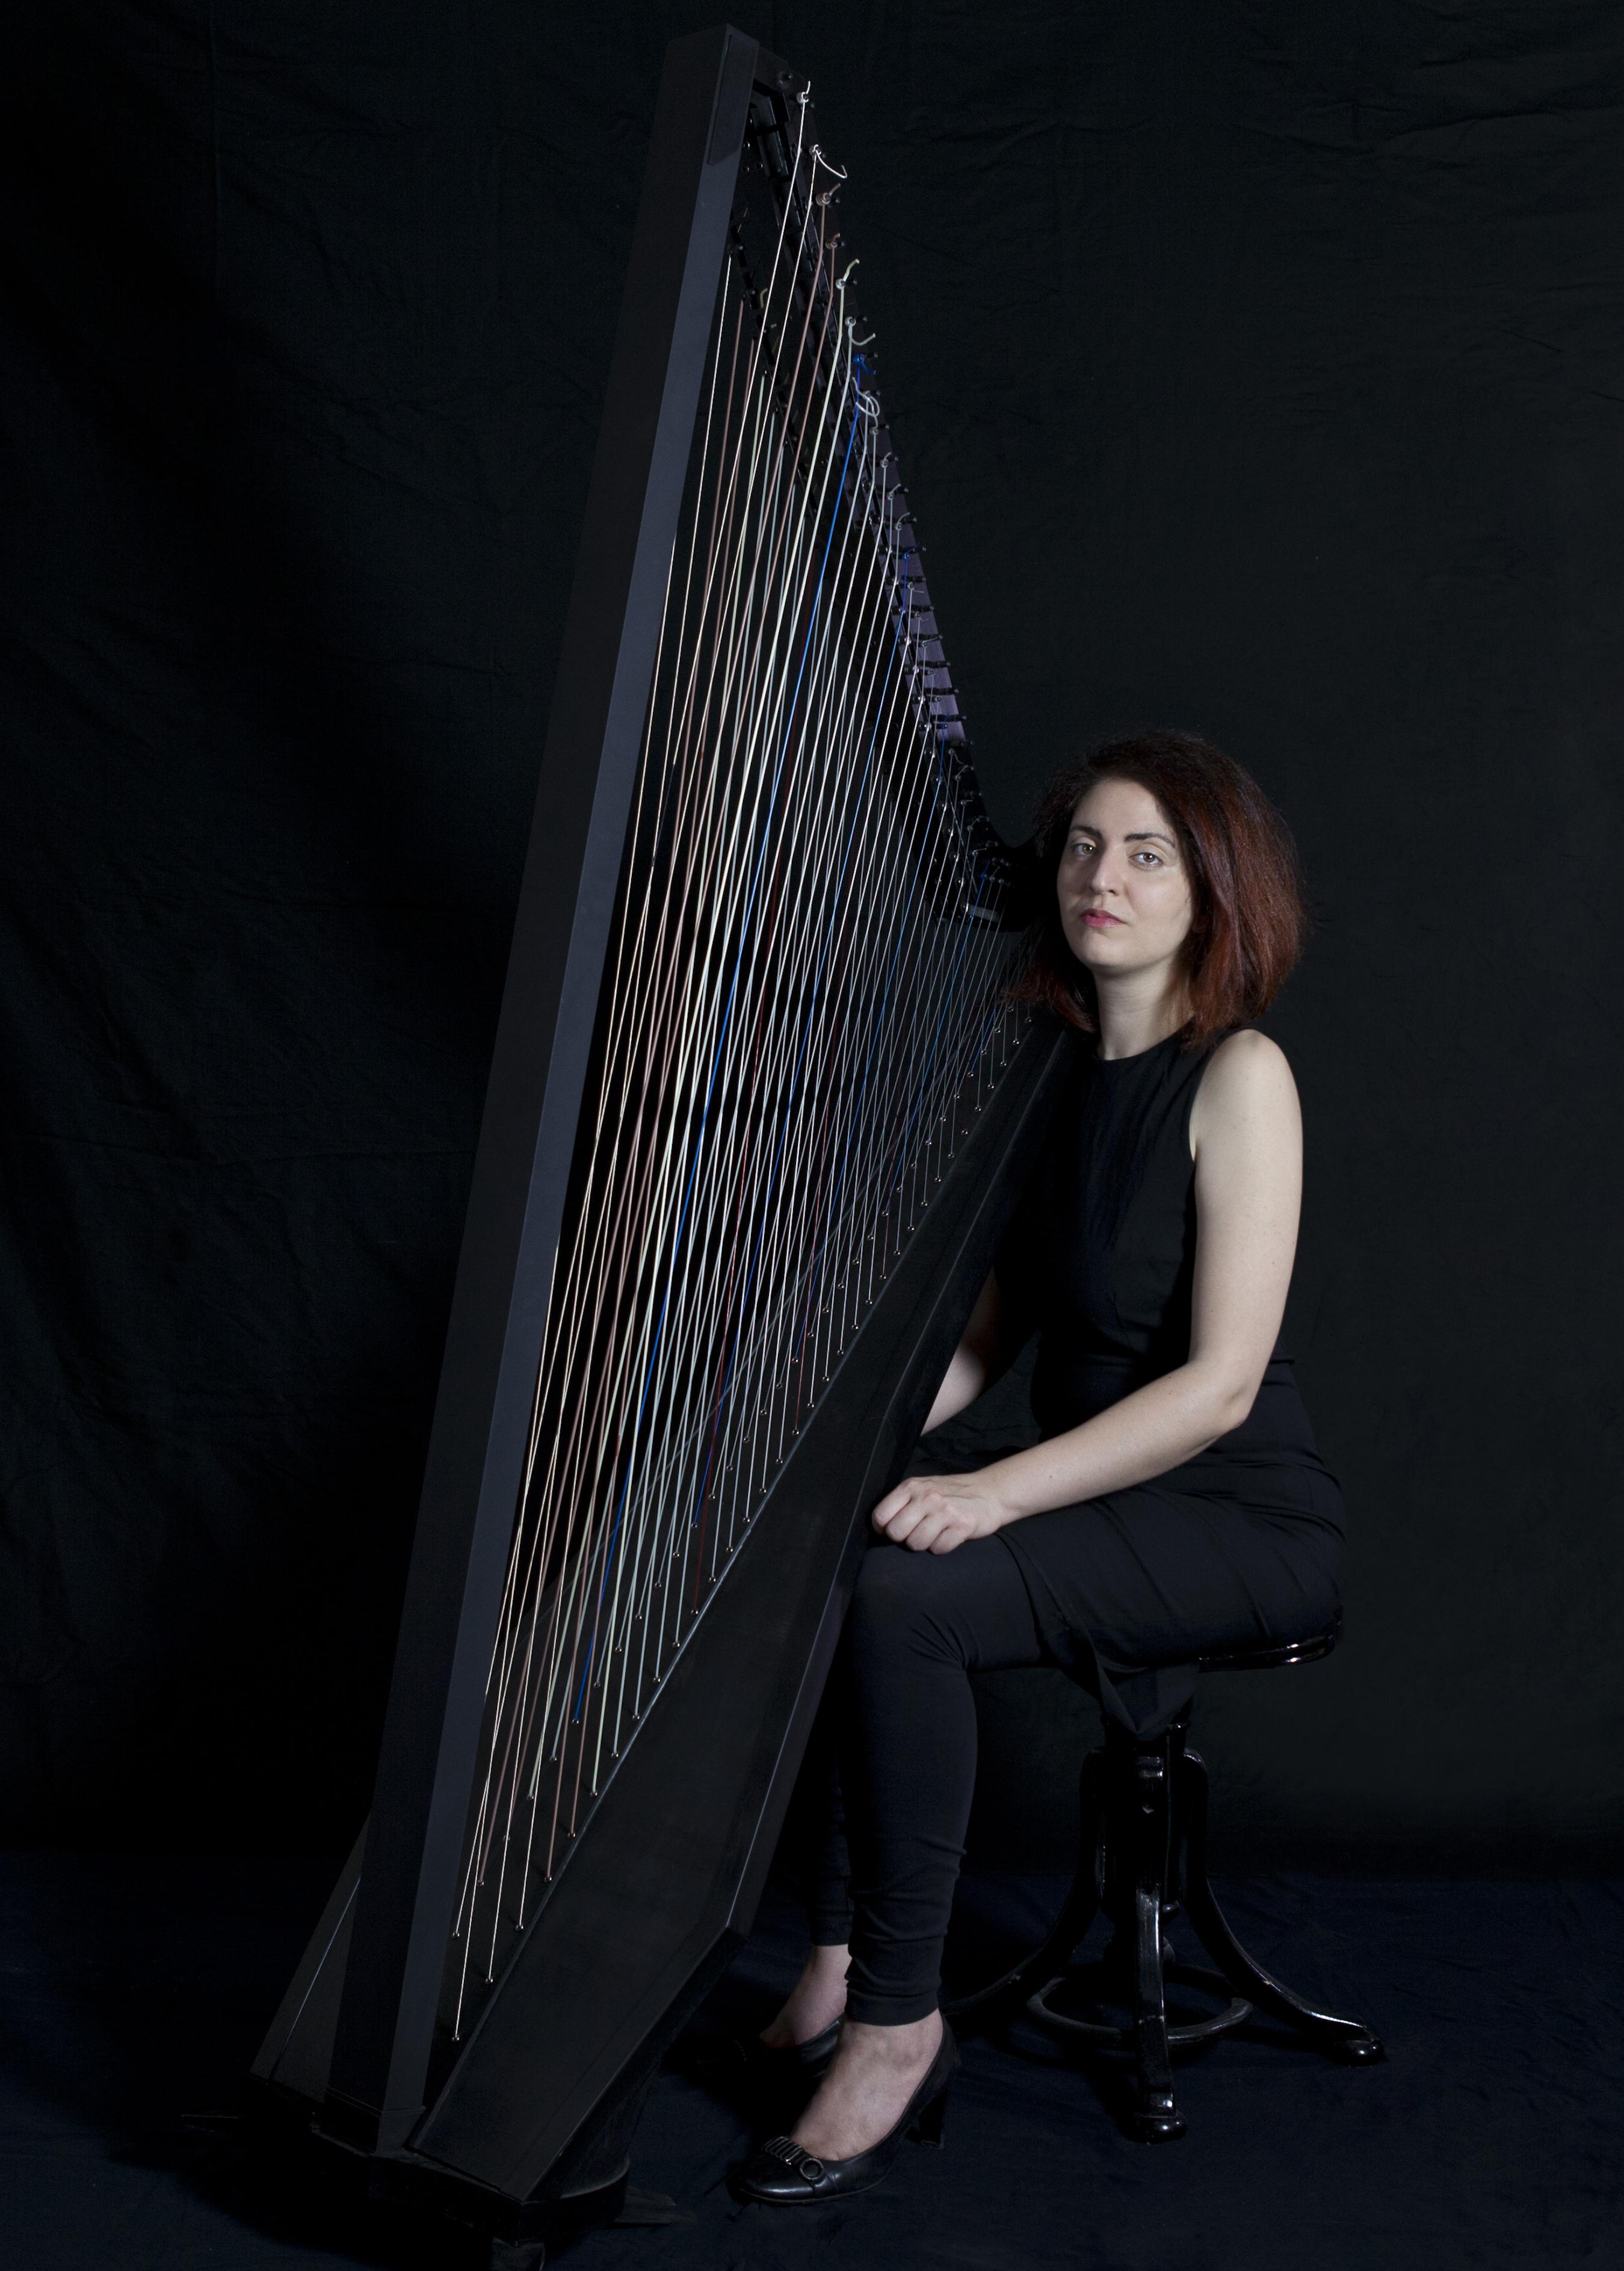 concert-pape-chromatic-harp-teacher-vanessa-daversa-2020-1